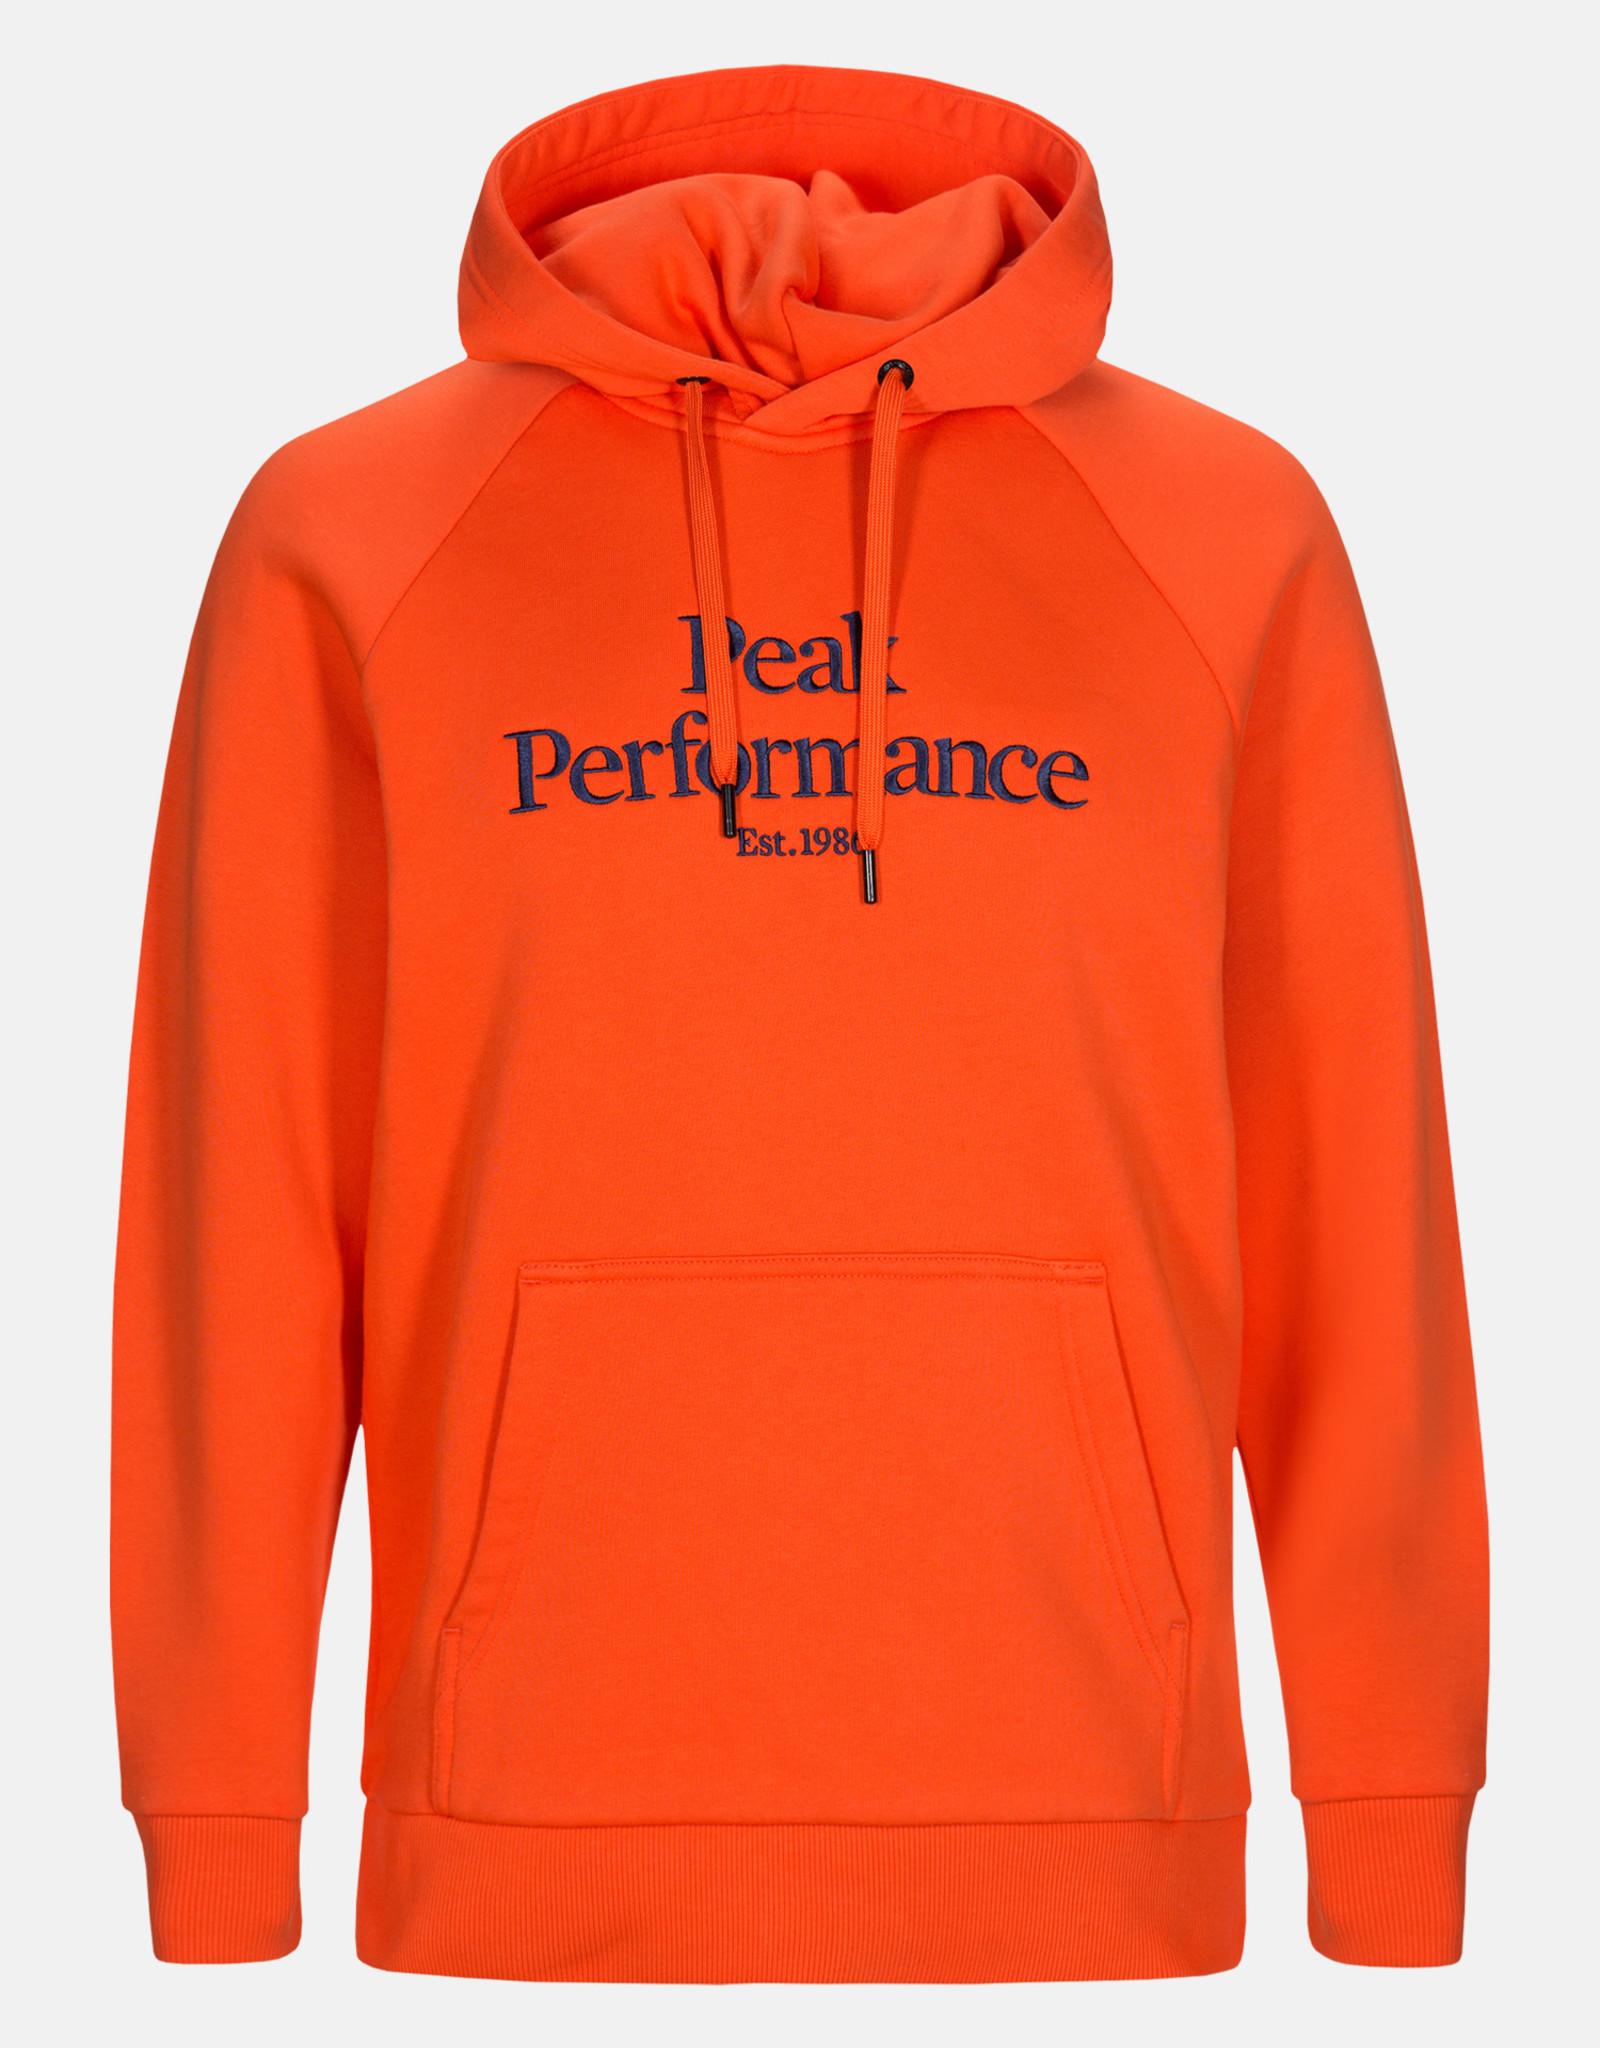 Peak Performance Peak Performance Men's Original Hood - S2020